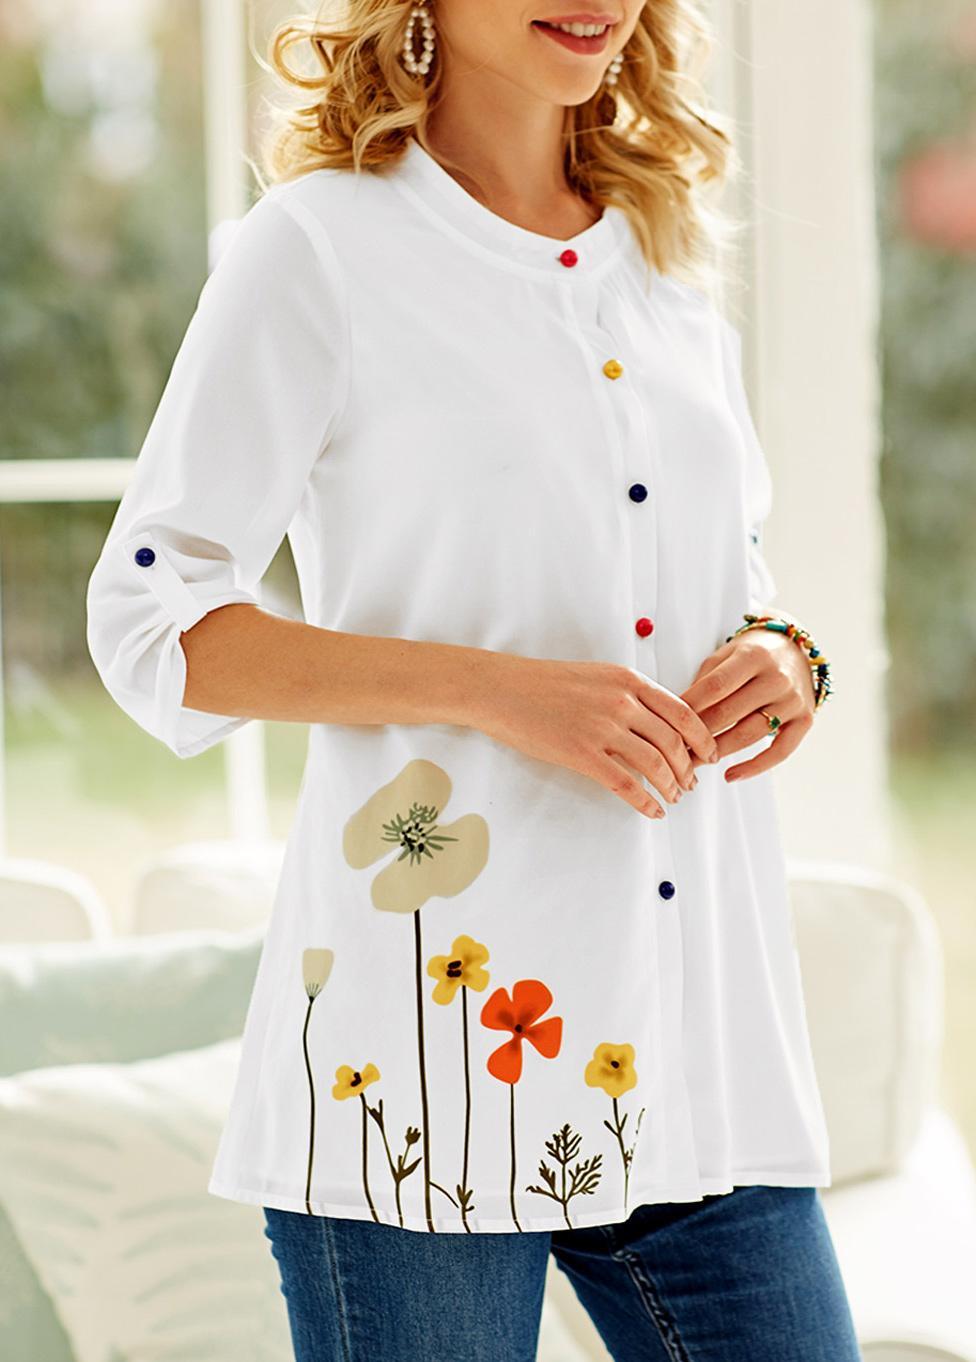 ROTITA Colorful Button Floral Print White Blouse